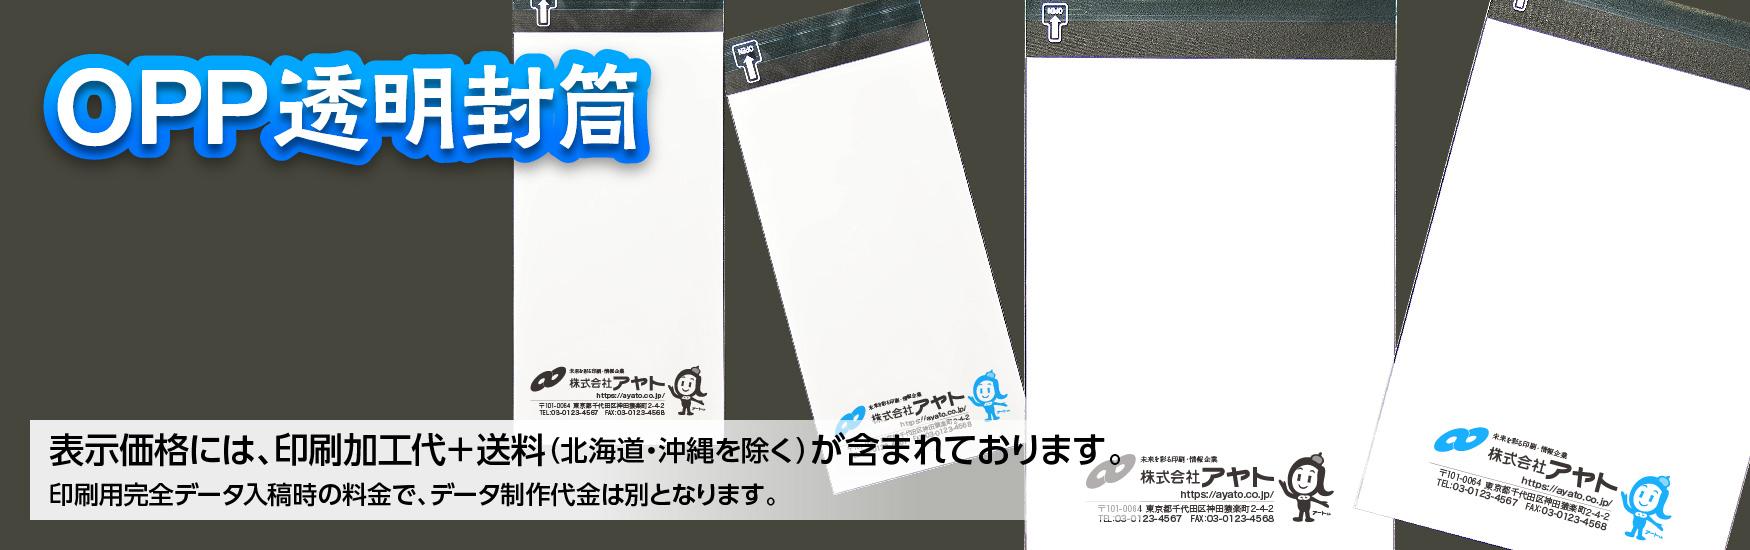 OPP長3封筒印刷バナー